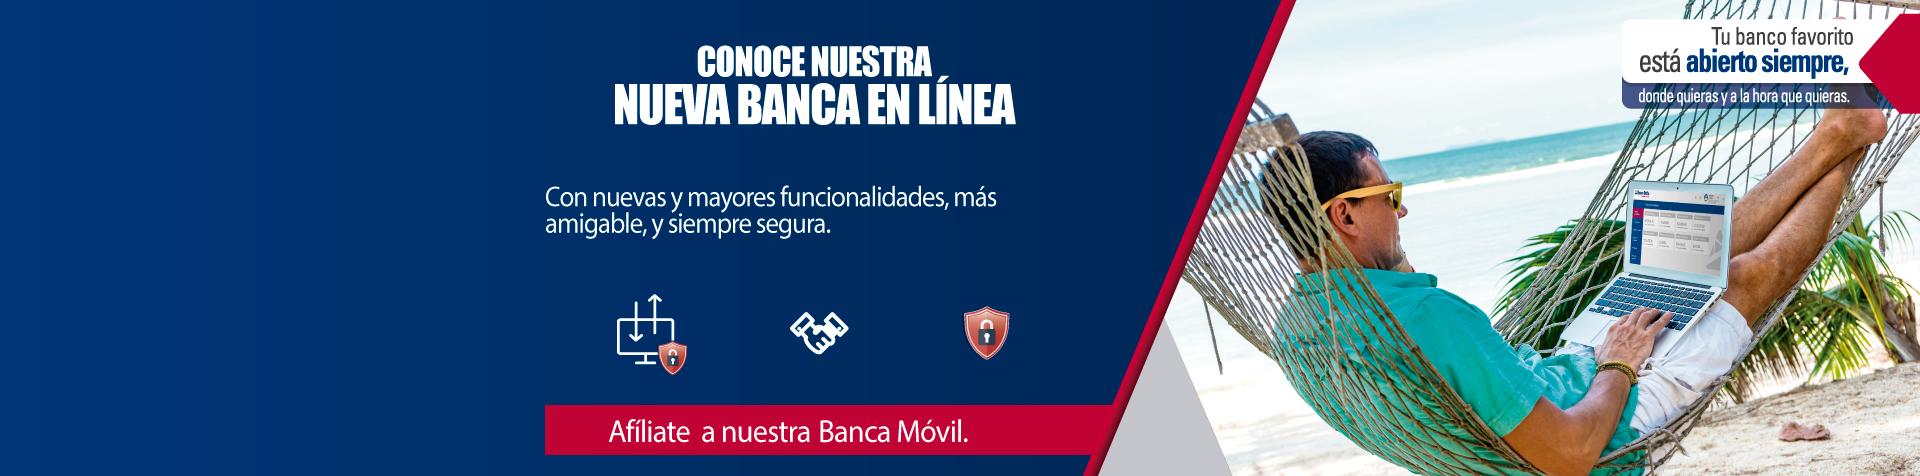 banca en linea